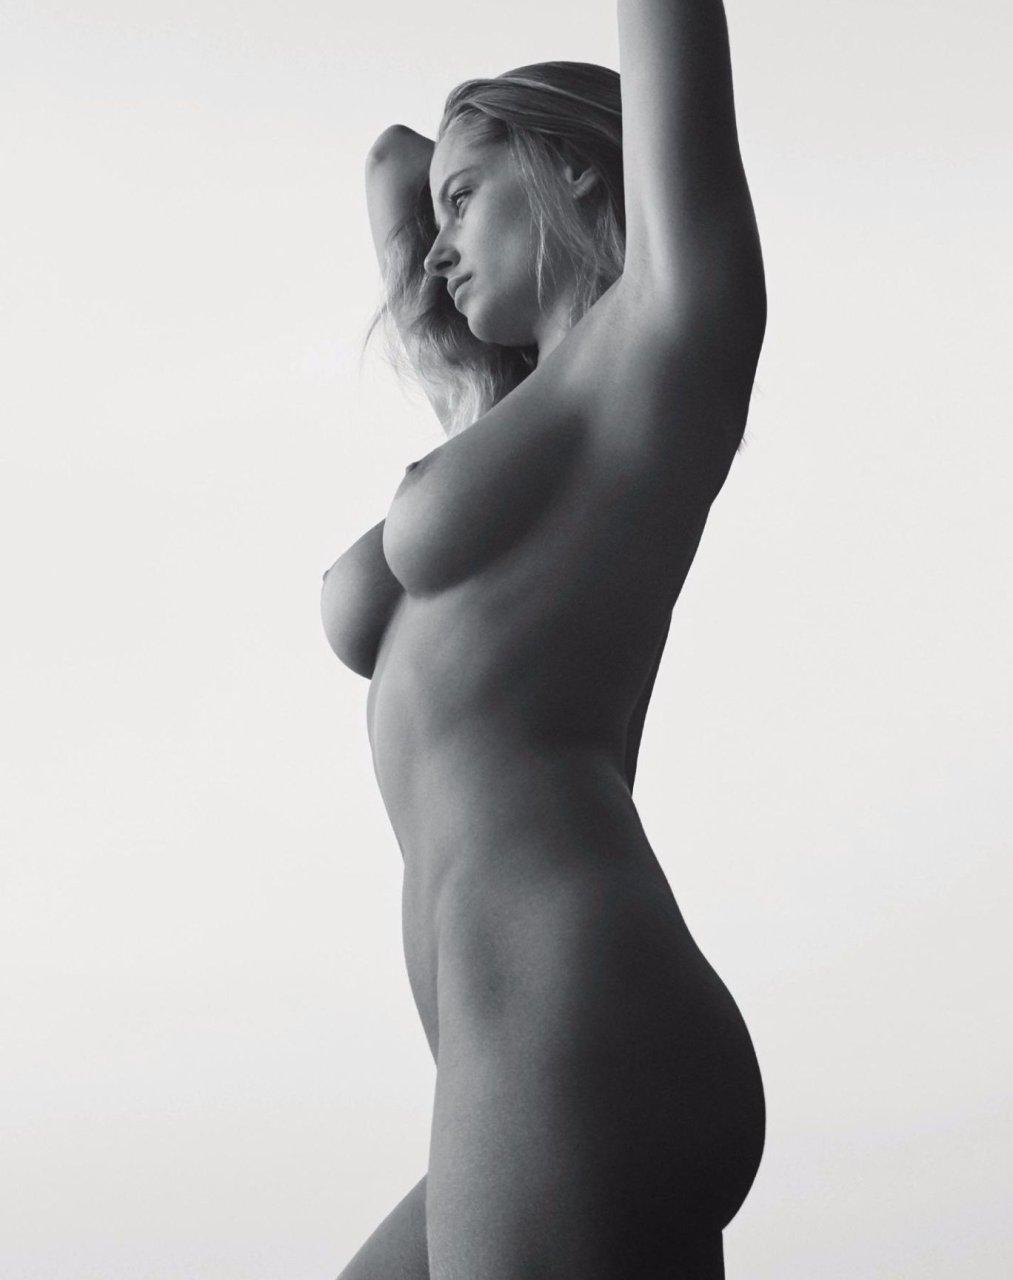 lady gaga nude hacked photo